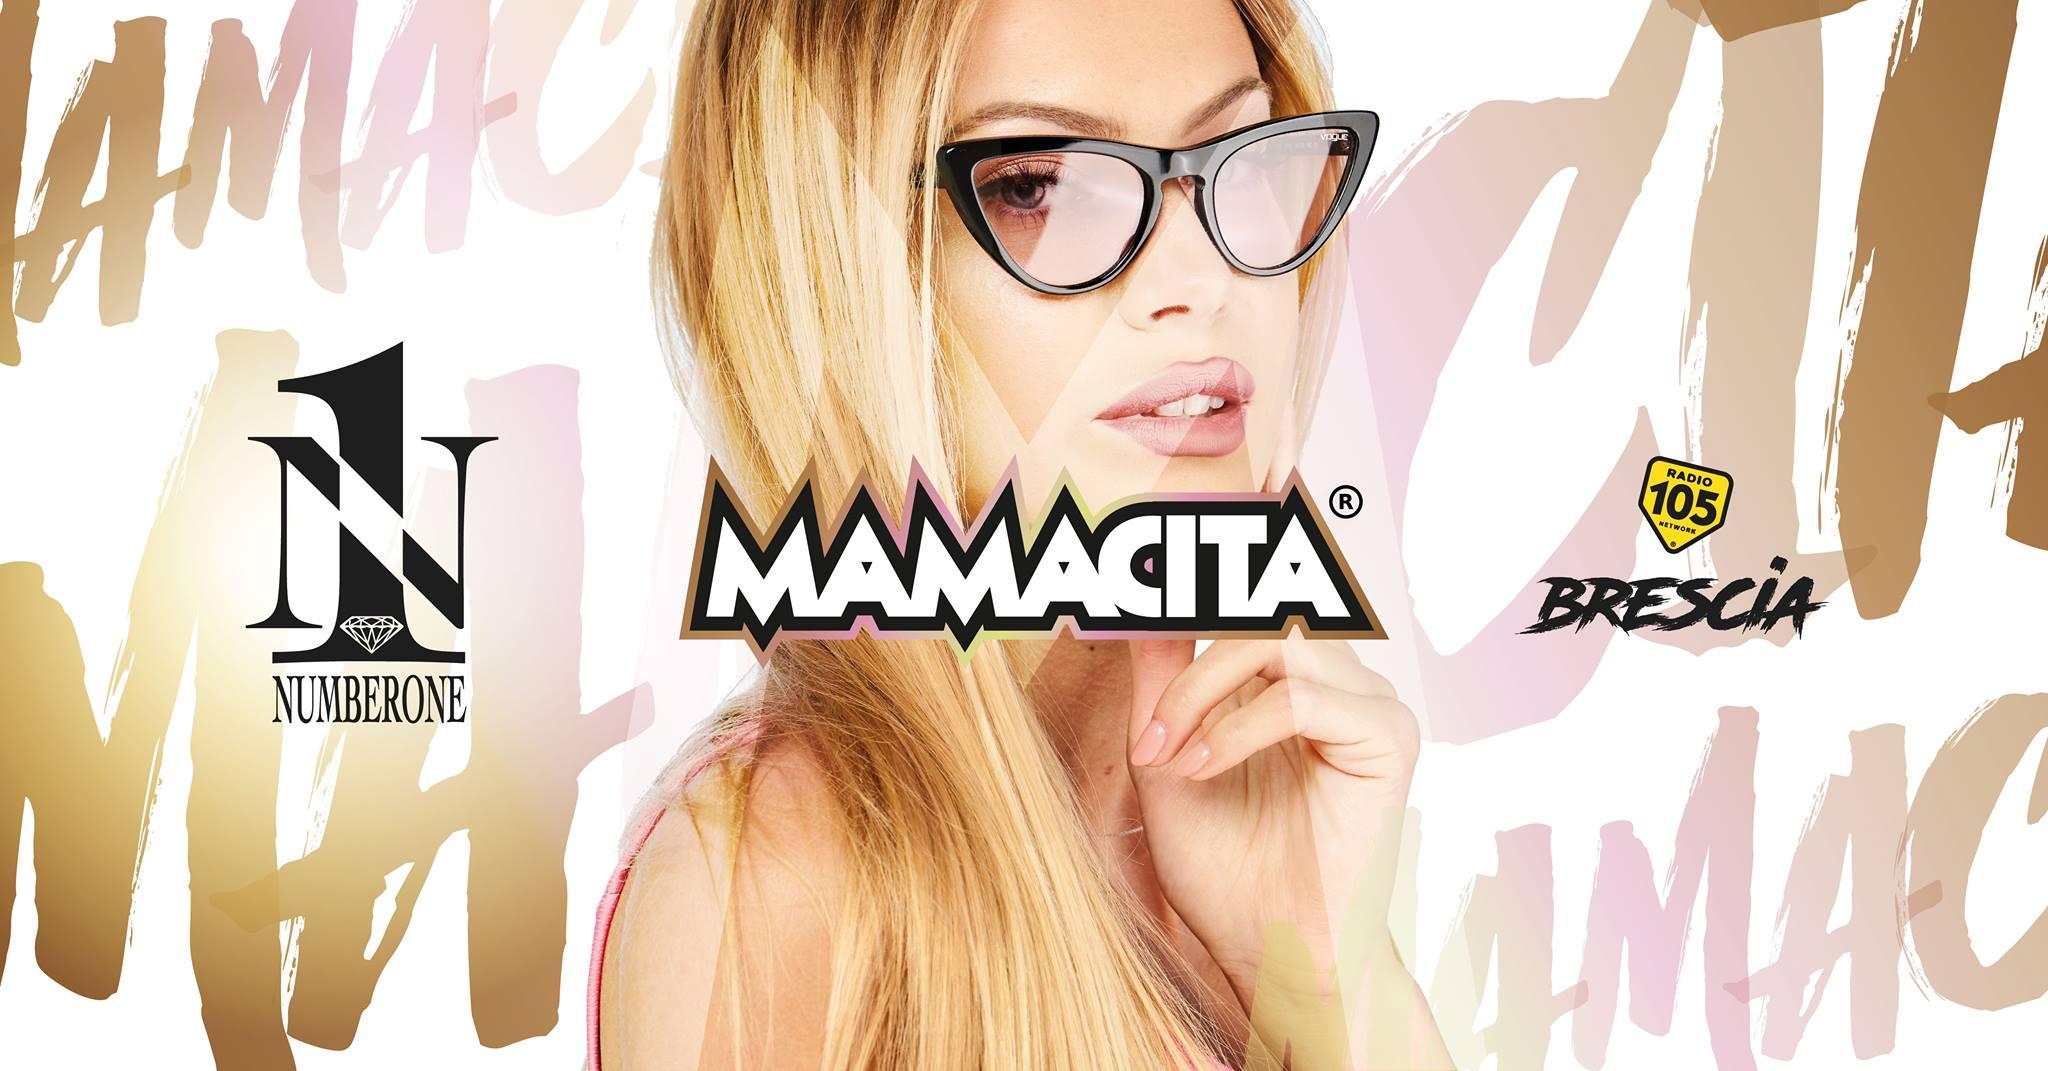 Mamacita • Number One • Brescia